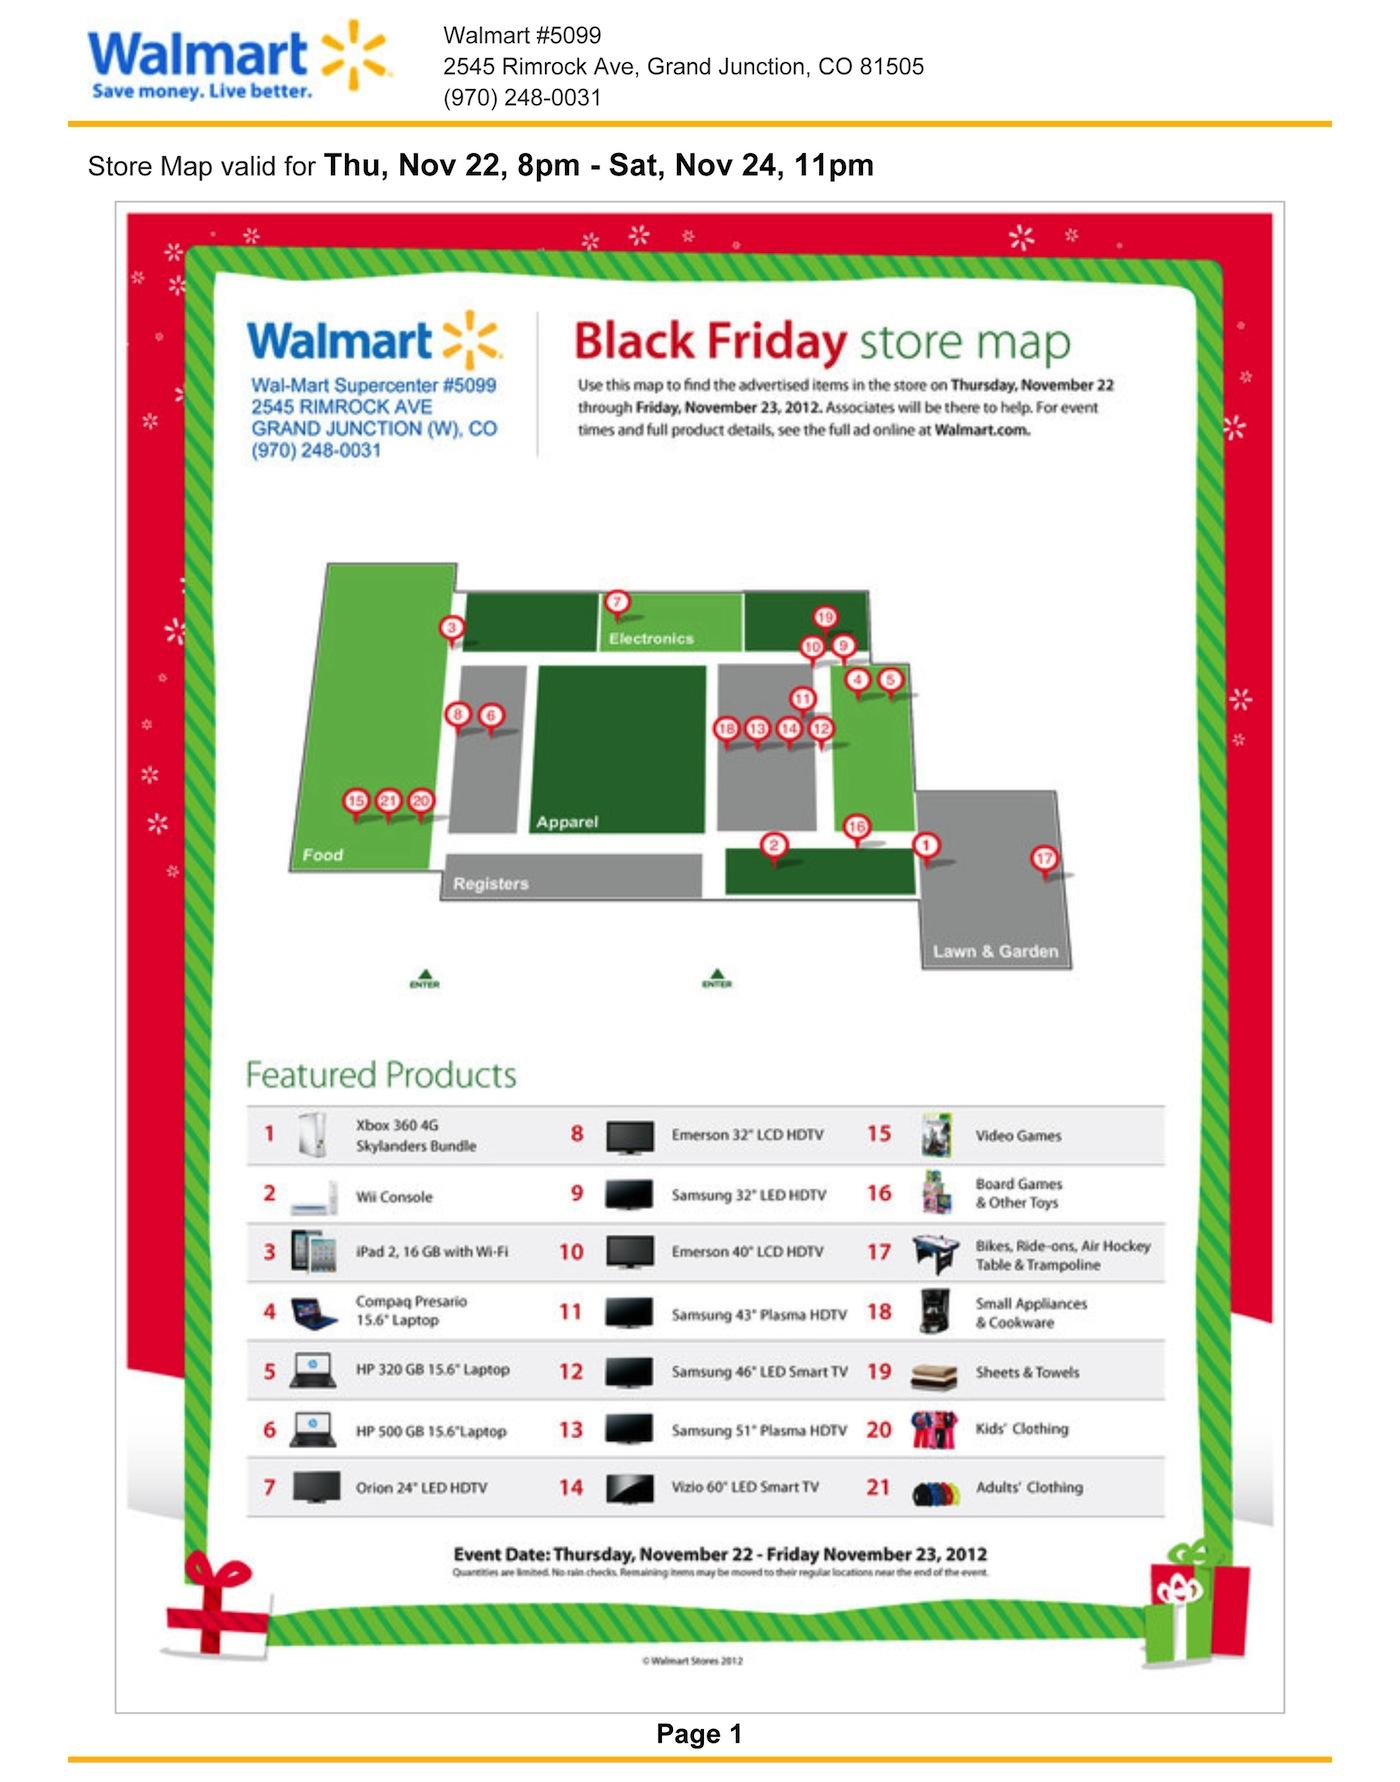 Walmart-Black-Friday-Store-Map1.jpg